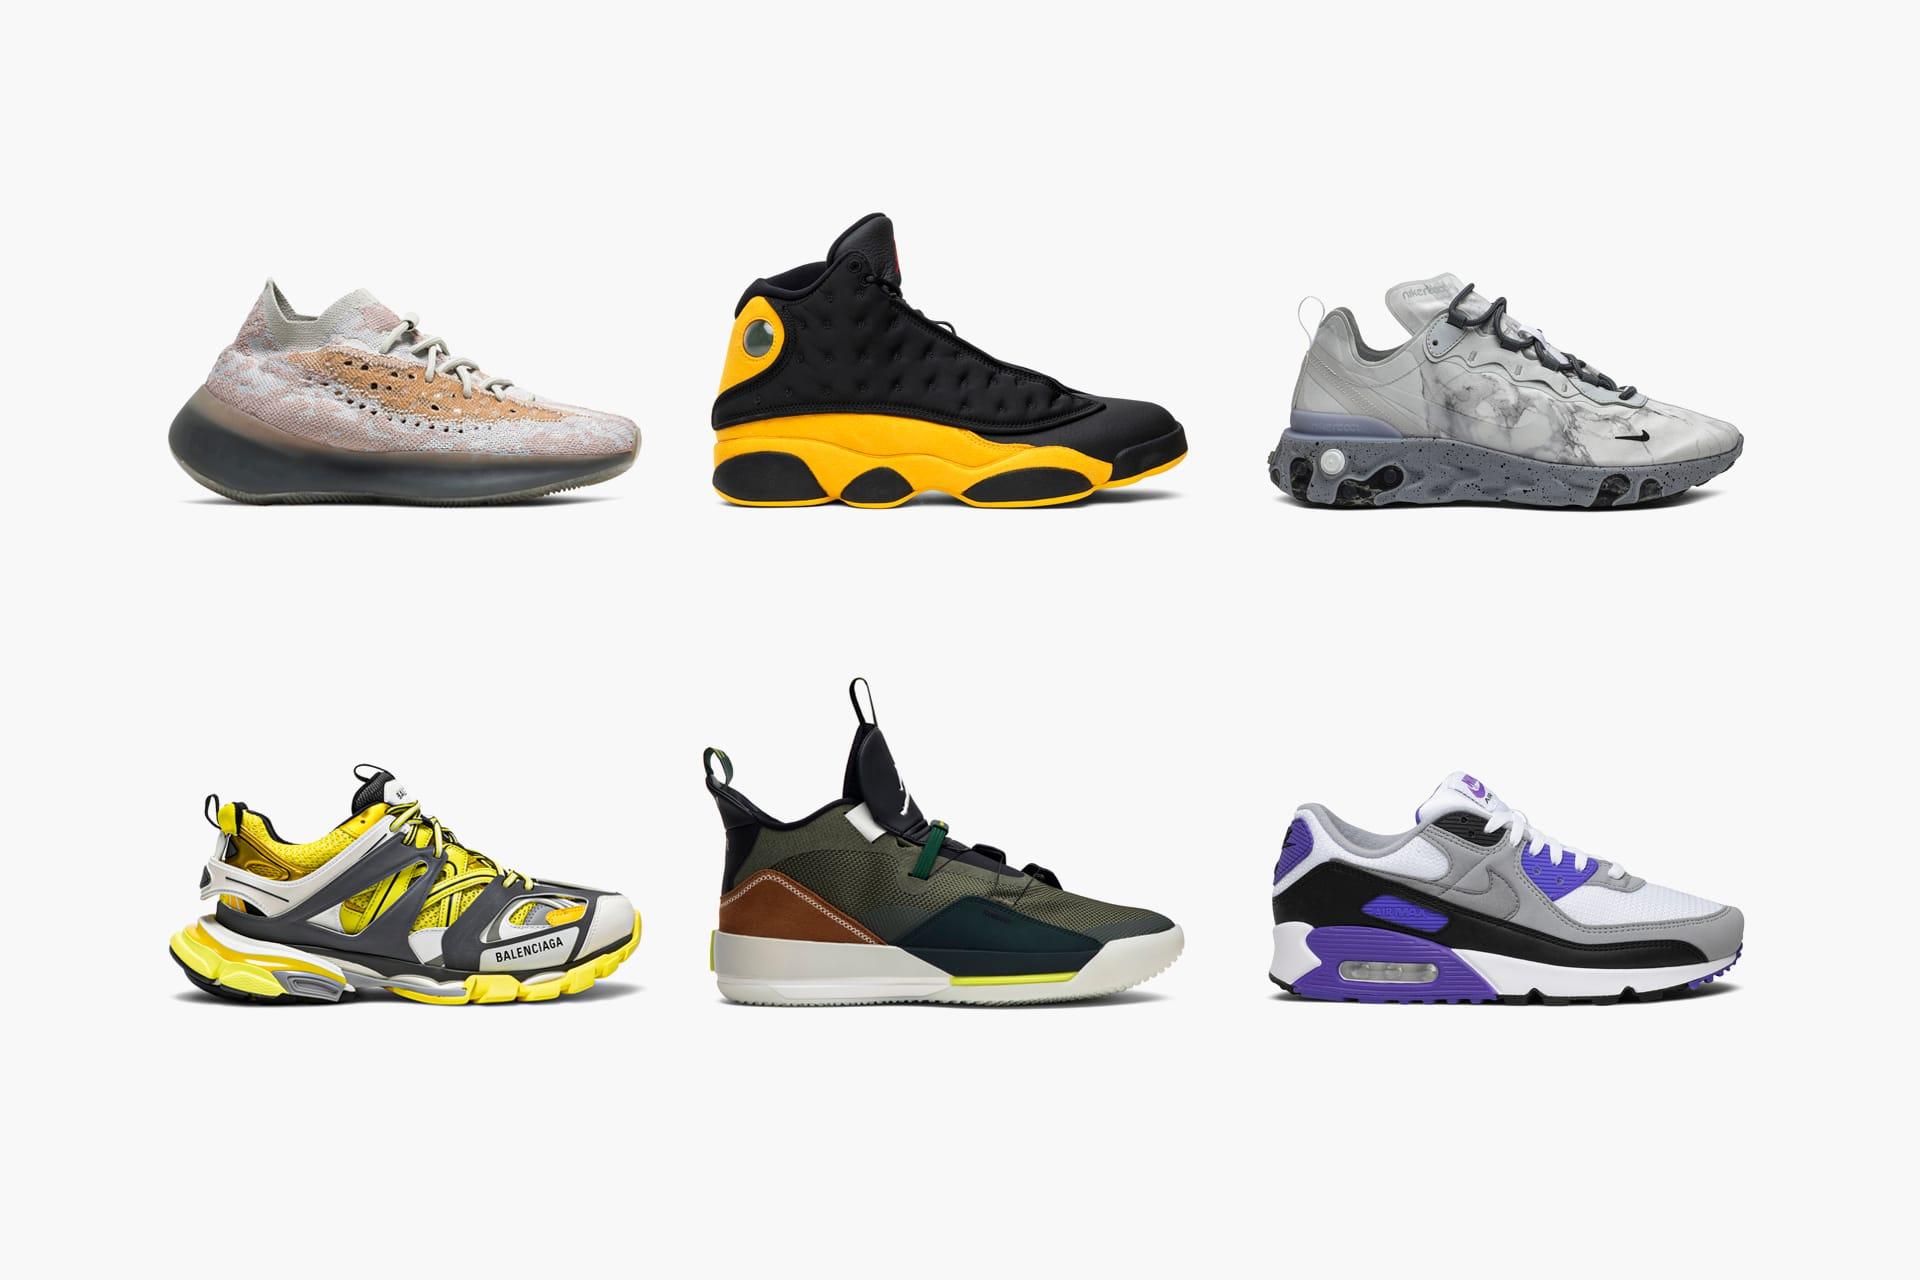 GOAT Best Cyber Monday Sneaker Deals